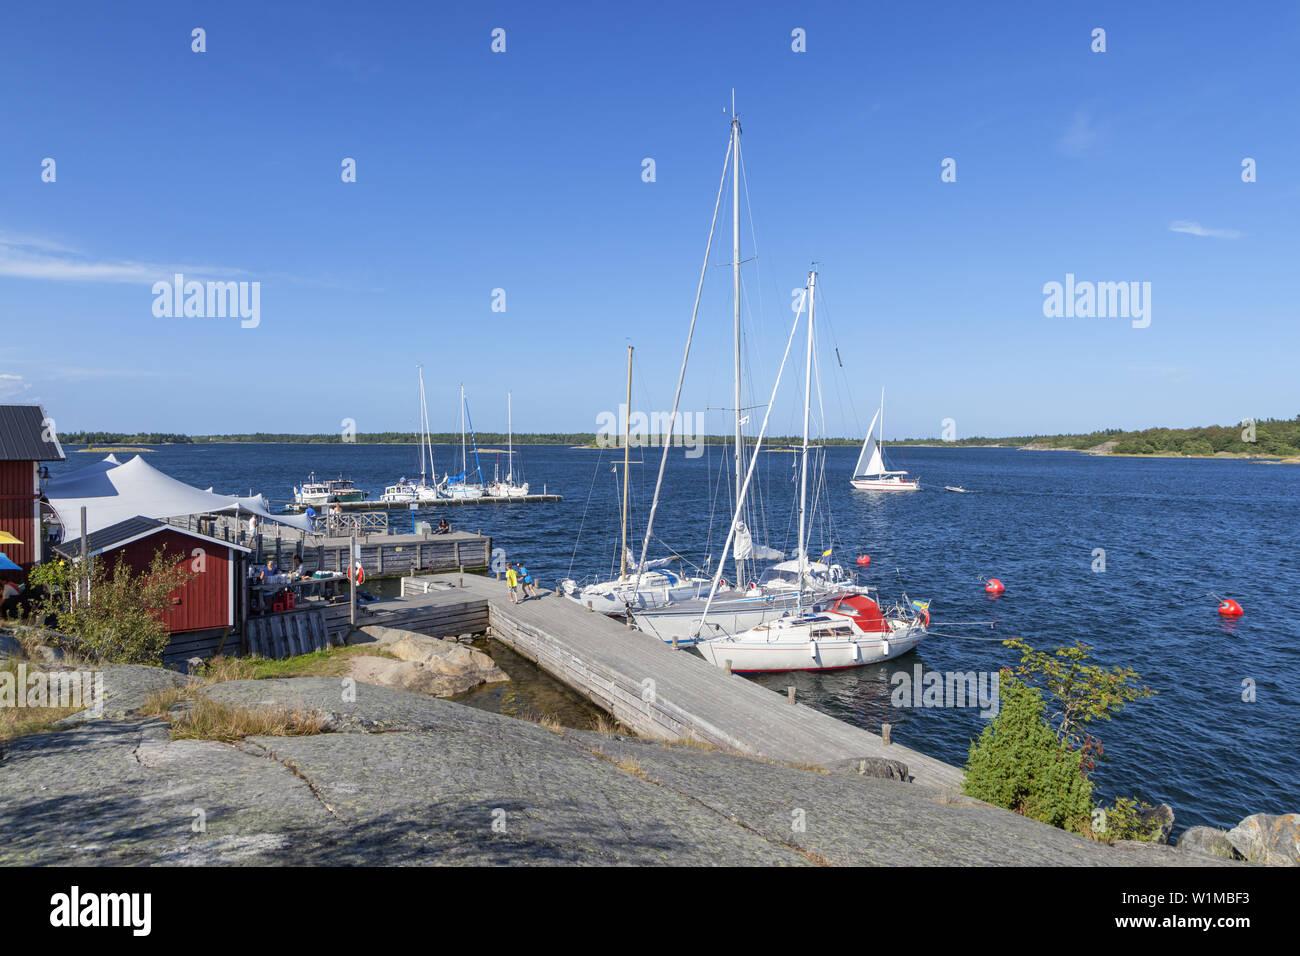 Fejan Skaergårdskrog och konferens dalla marina sull'isola Fejan, Northern arcipelago di Stoccolma, Uppland, Stockholms County, a sud della Svezia, Svezia, Foto Stock